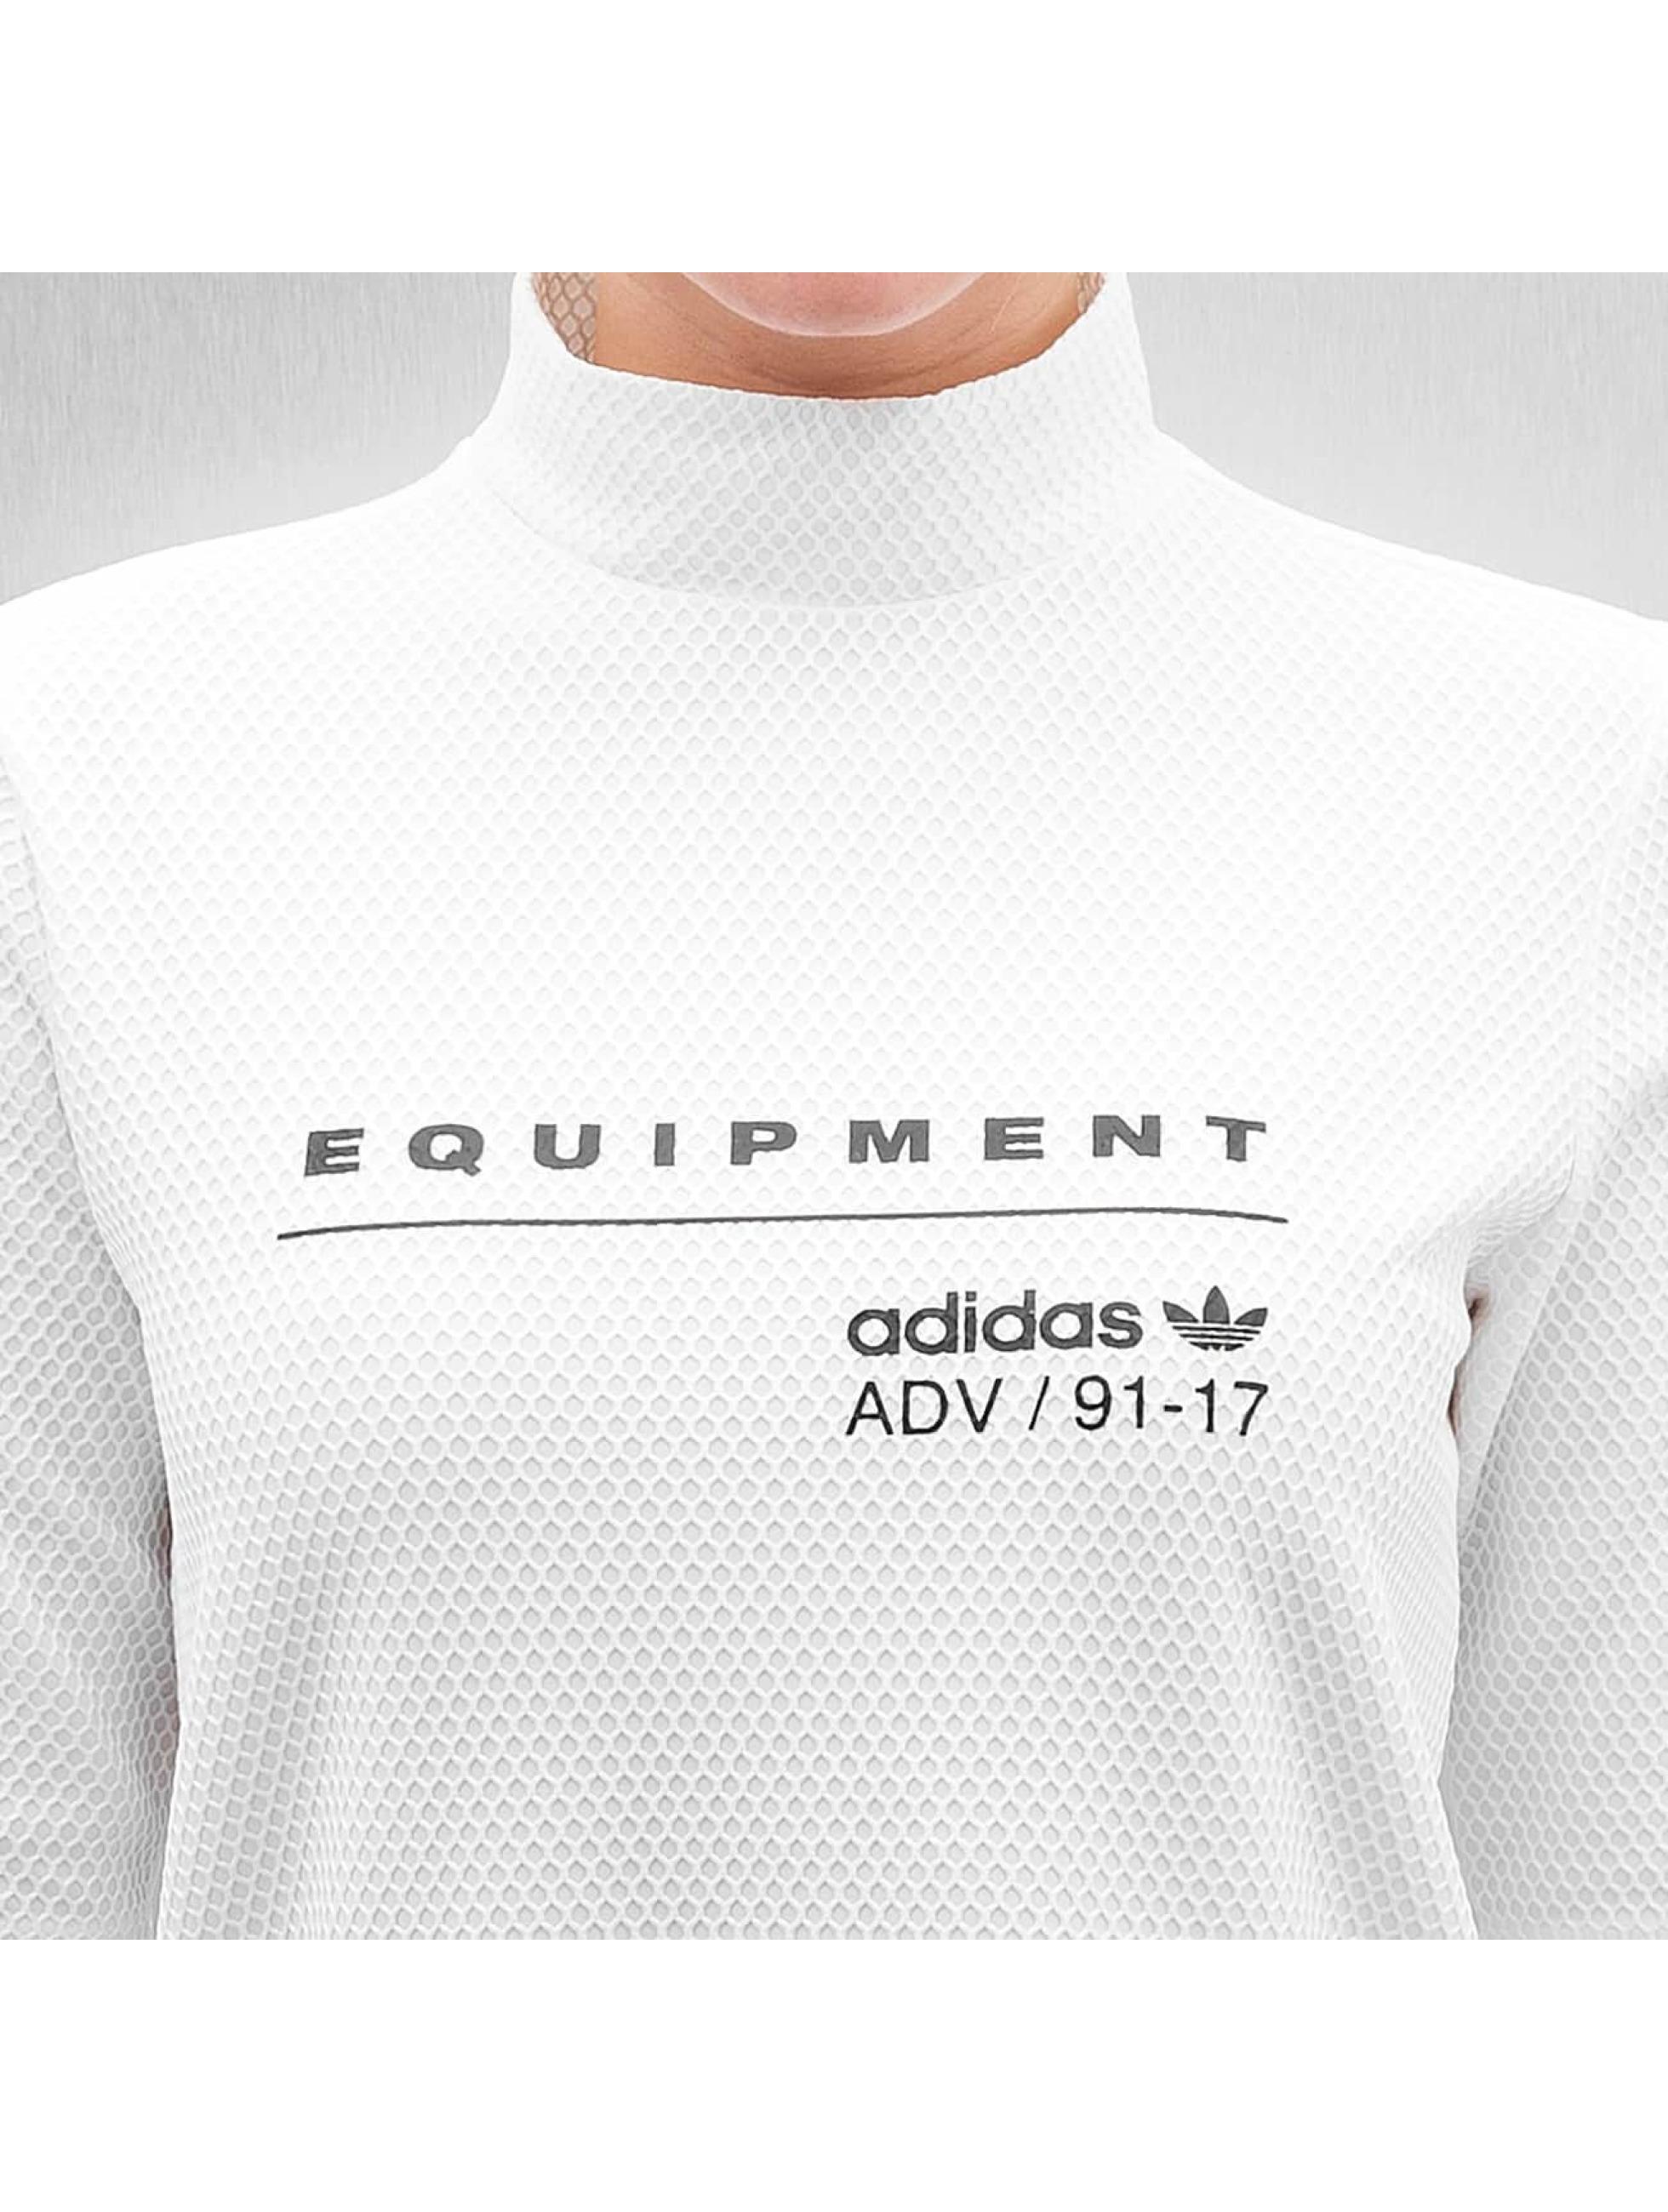 adidas Jumper Mesh Shortsleeve white